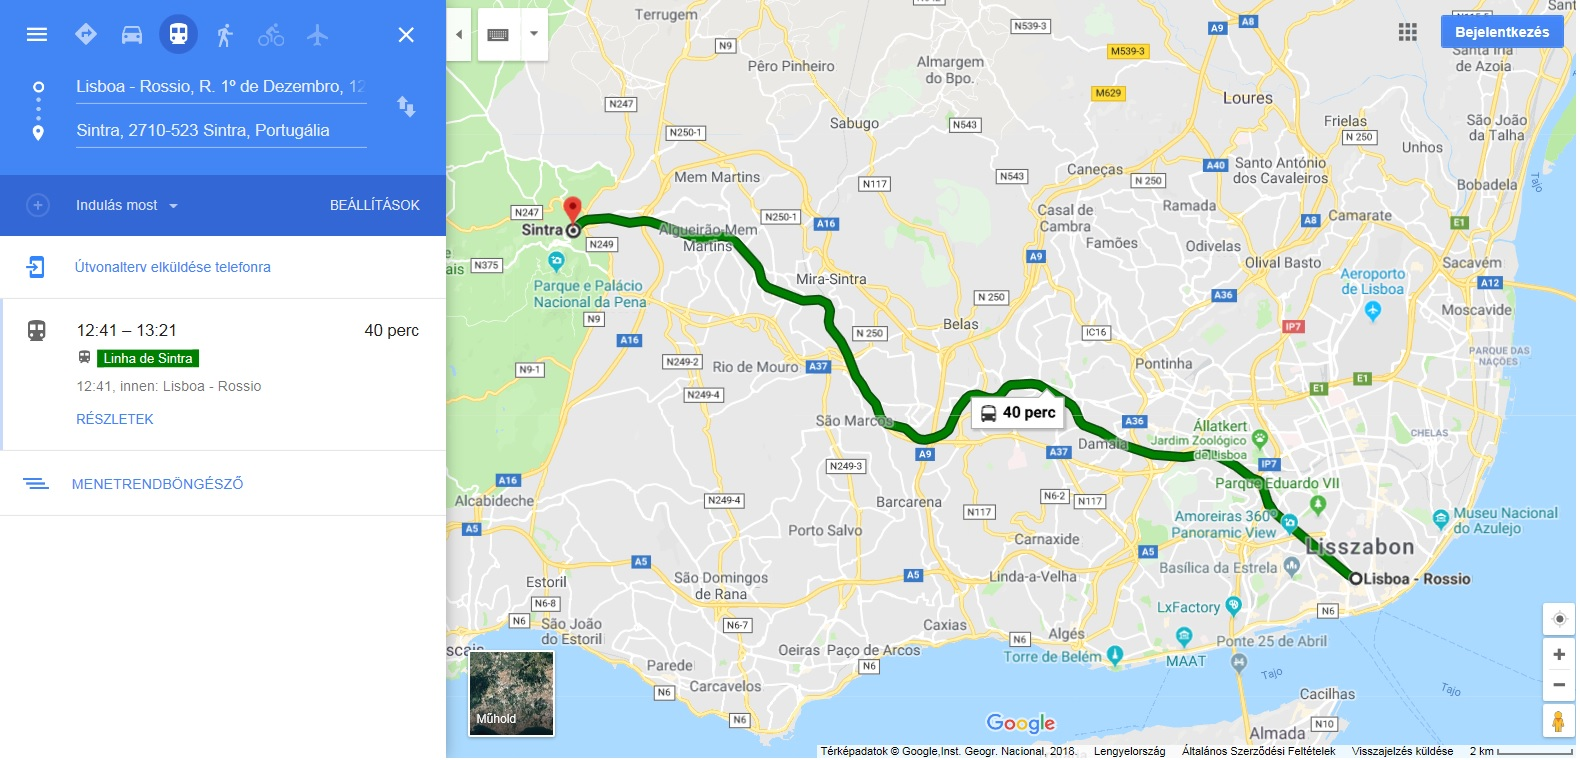 sintra_map.jpg